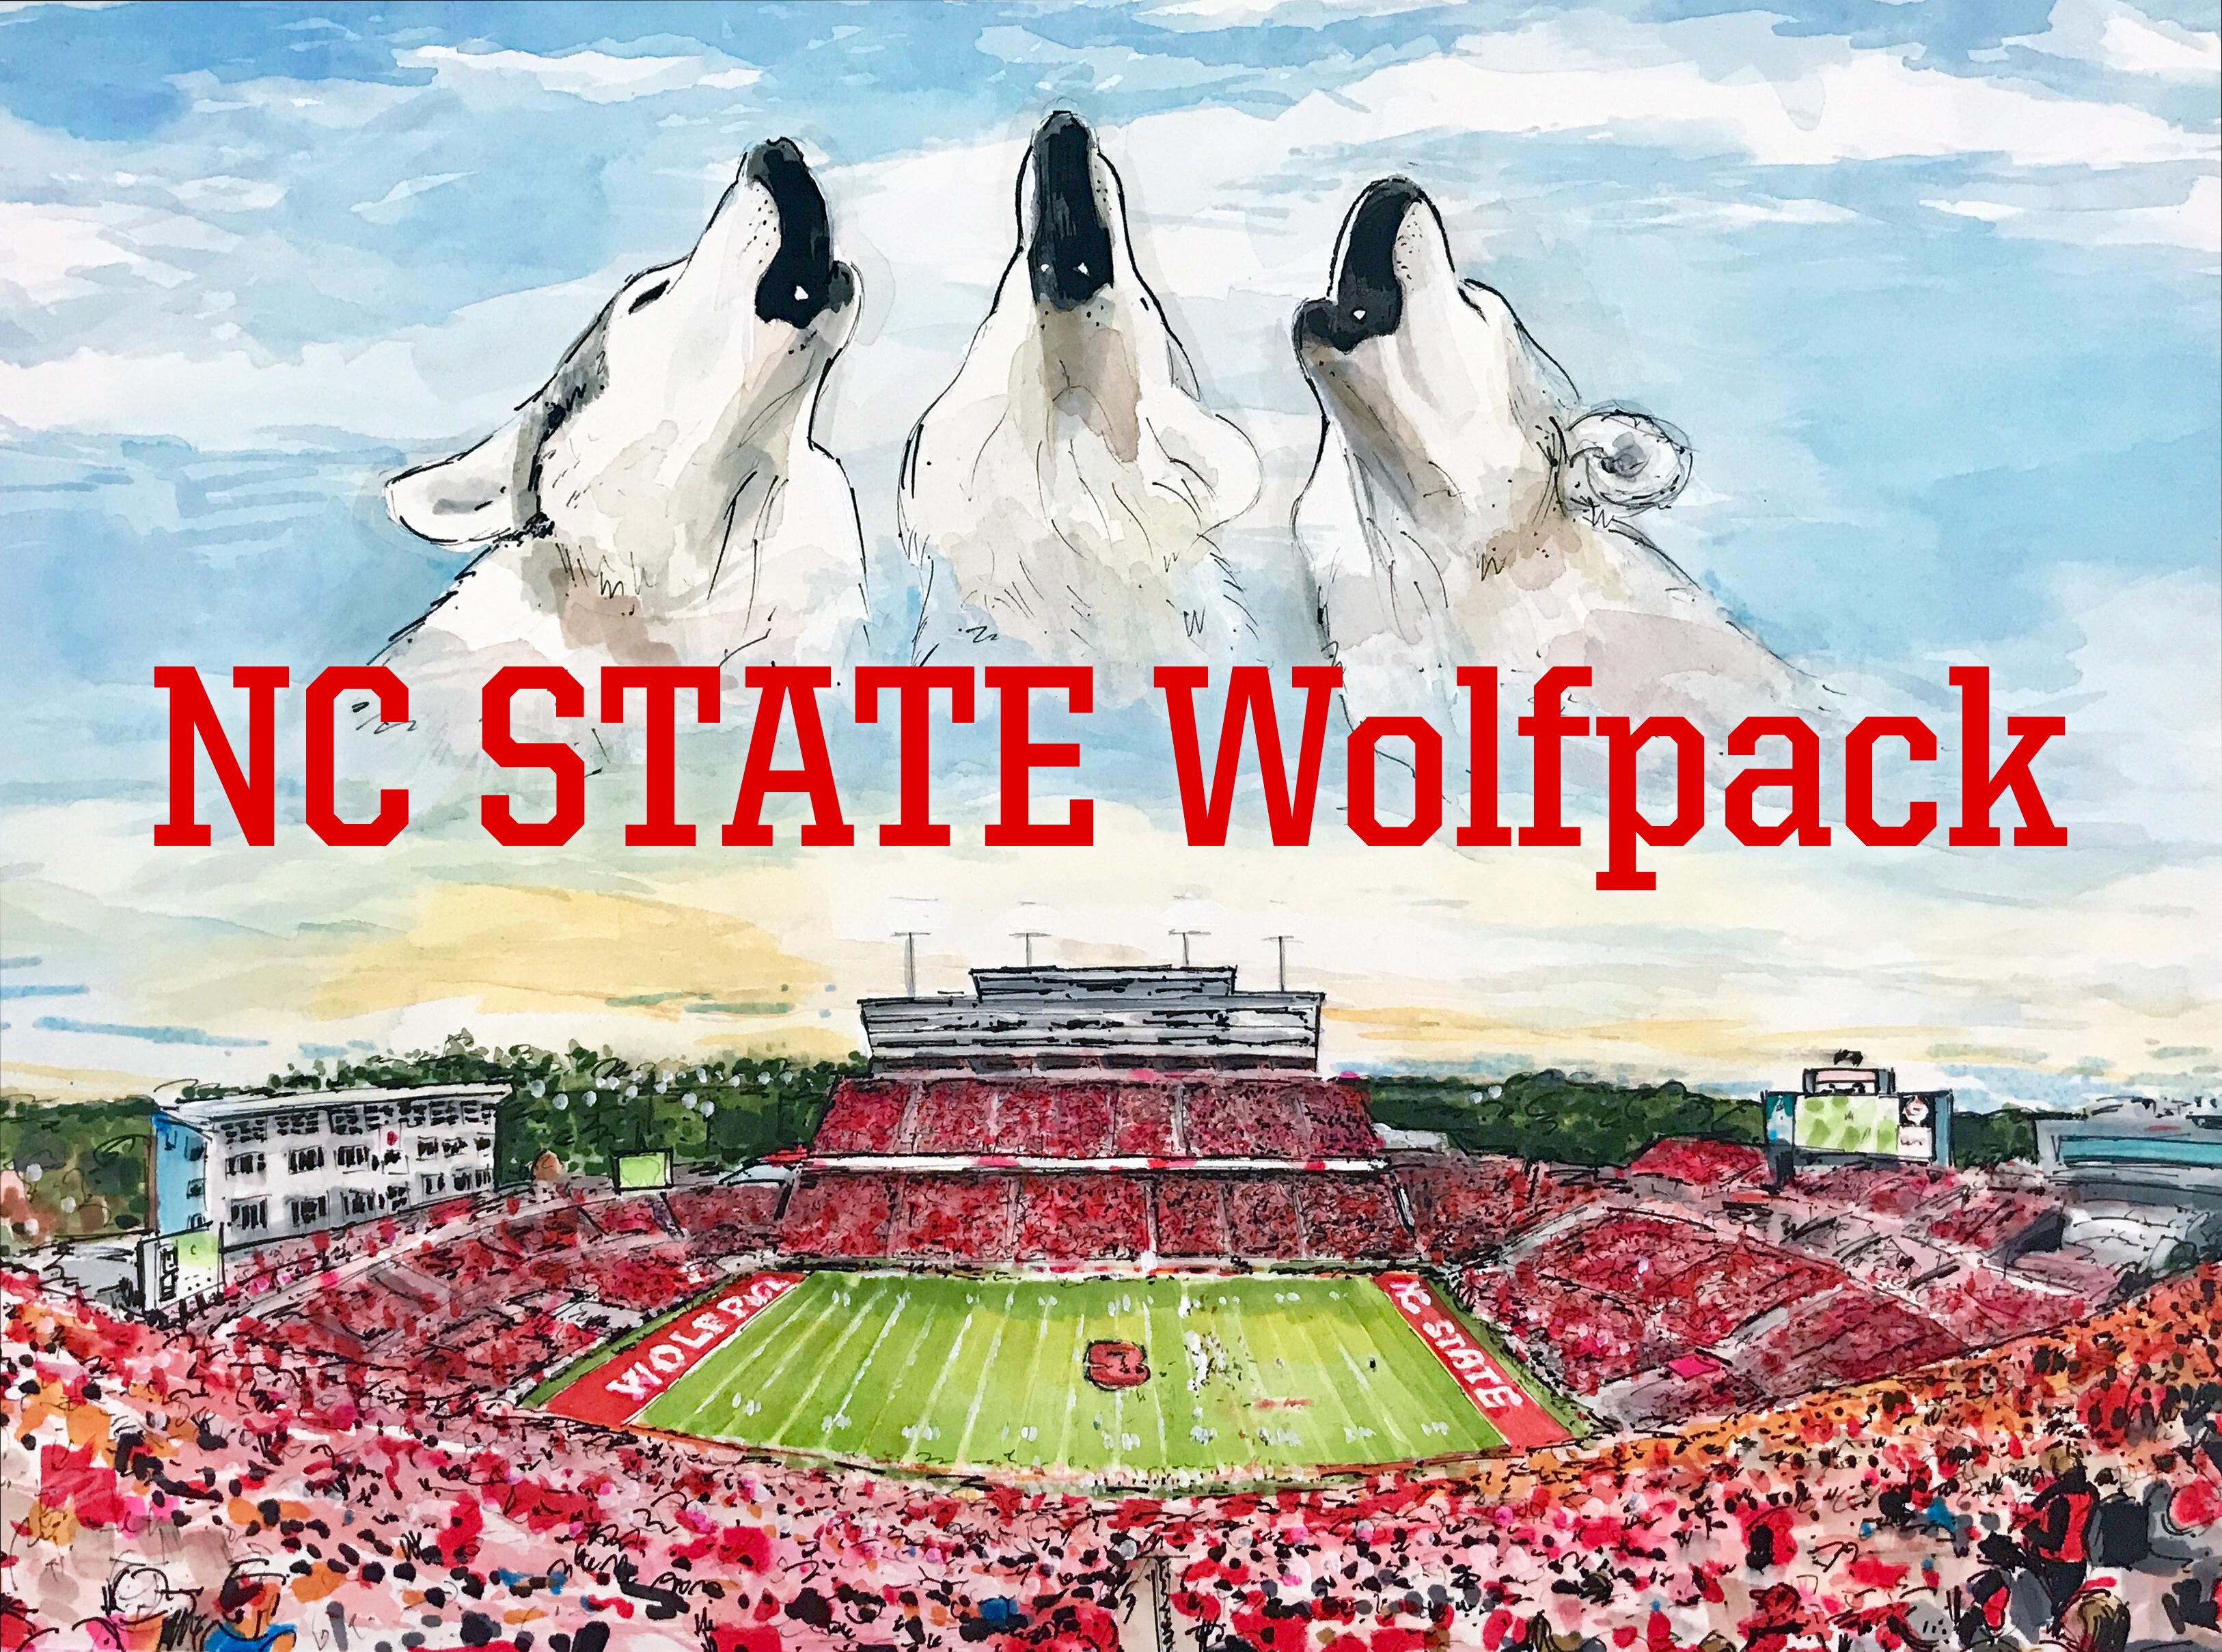 NC State - Carter-Finley Stadium